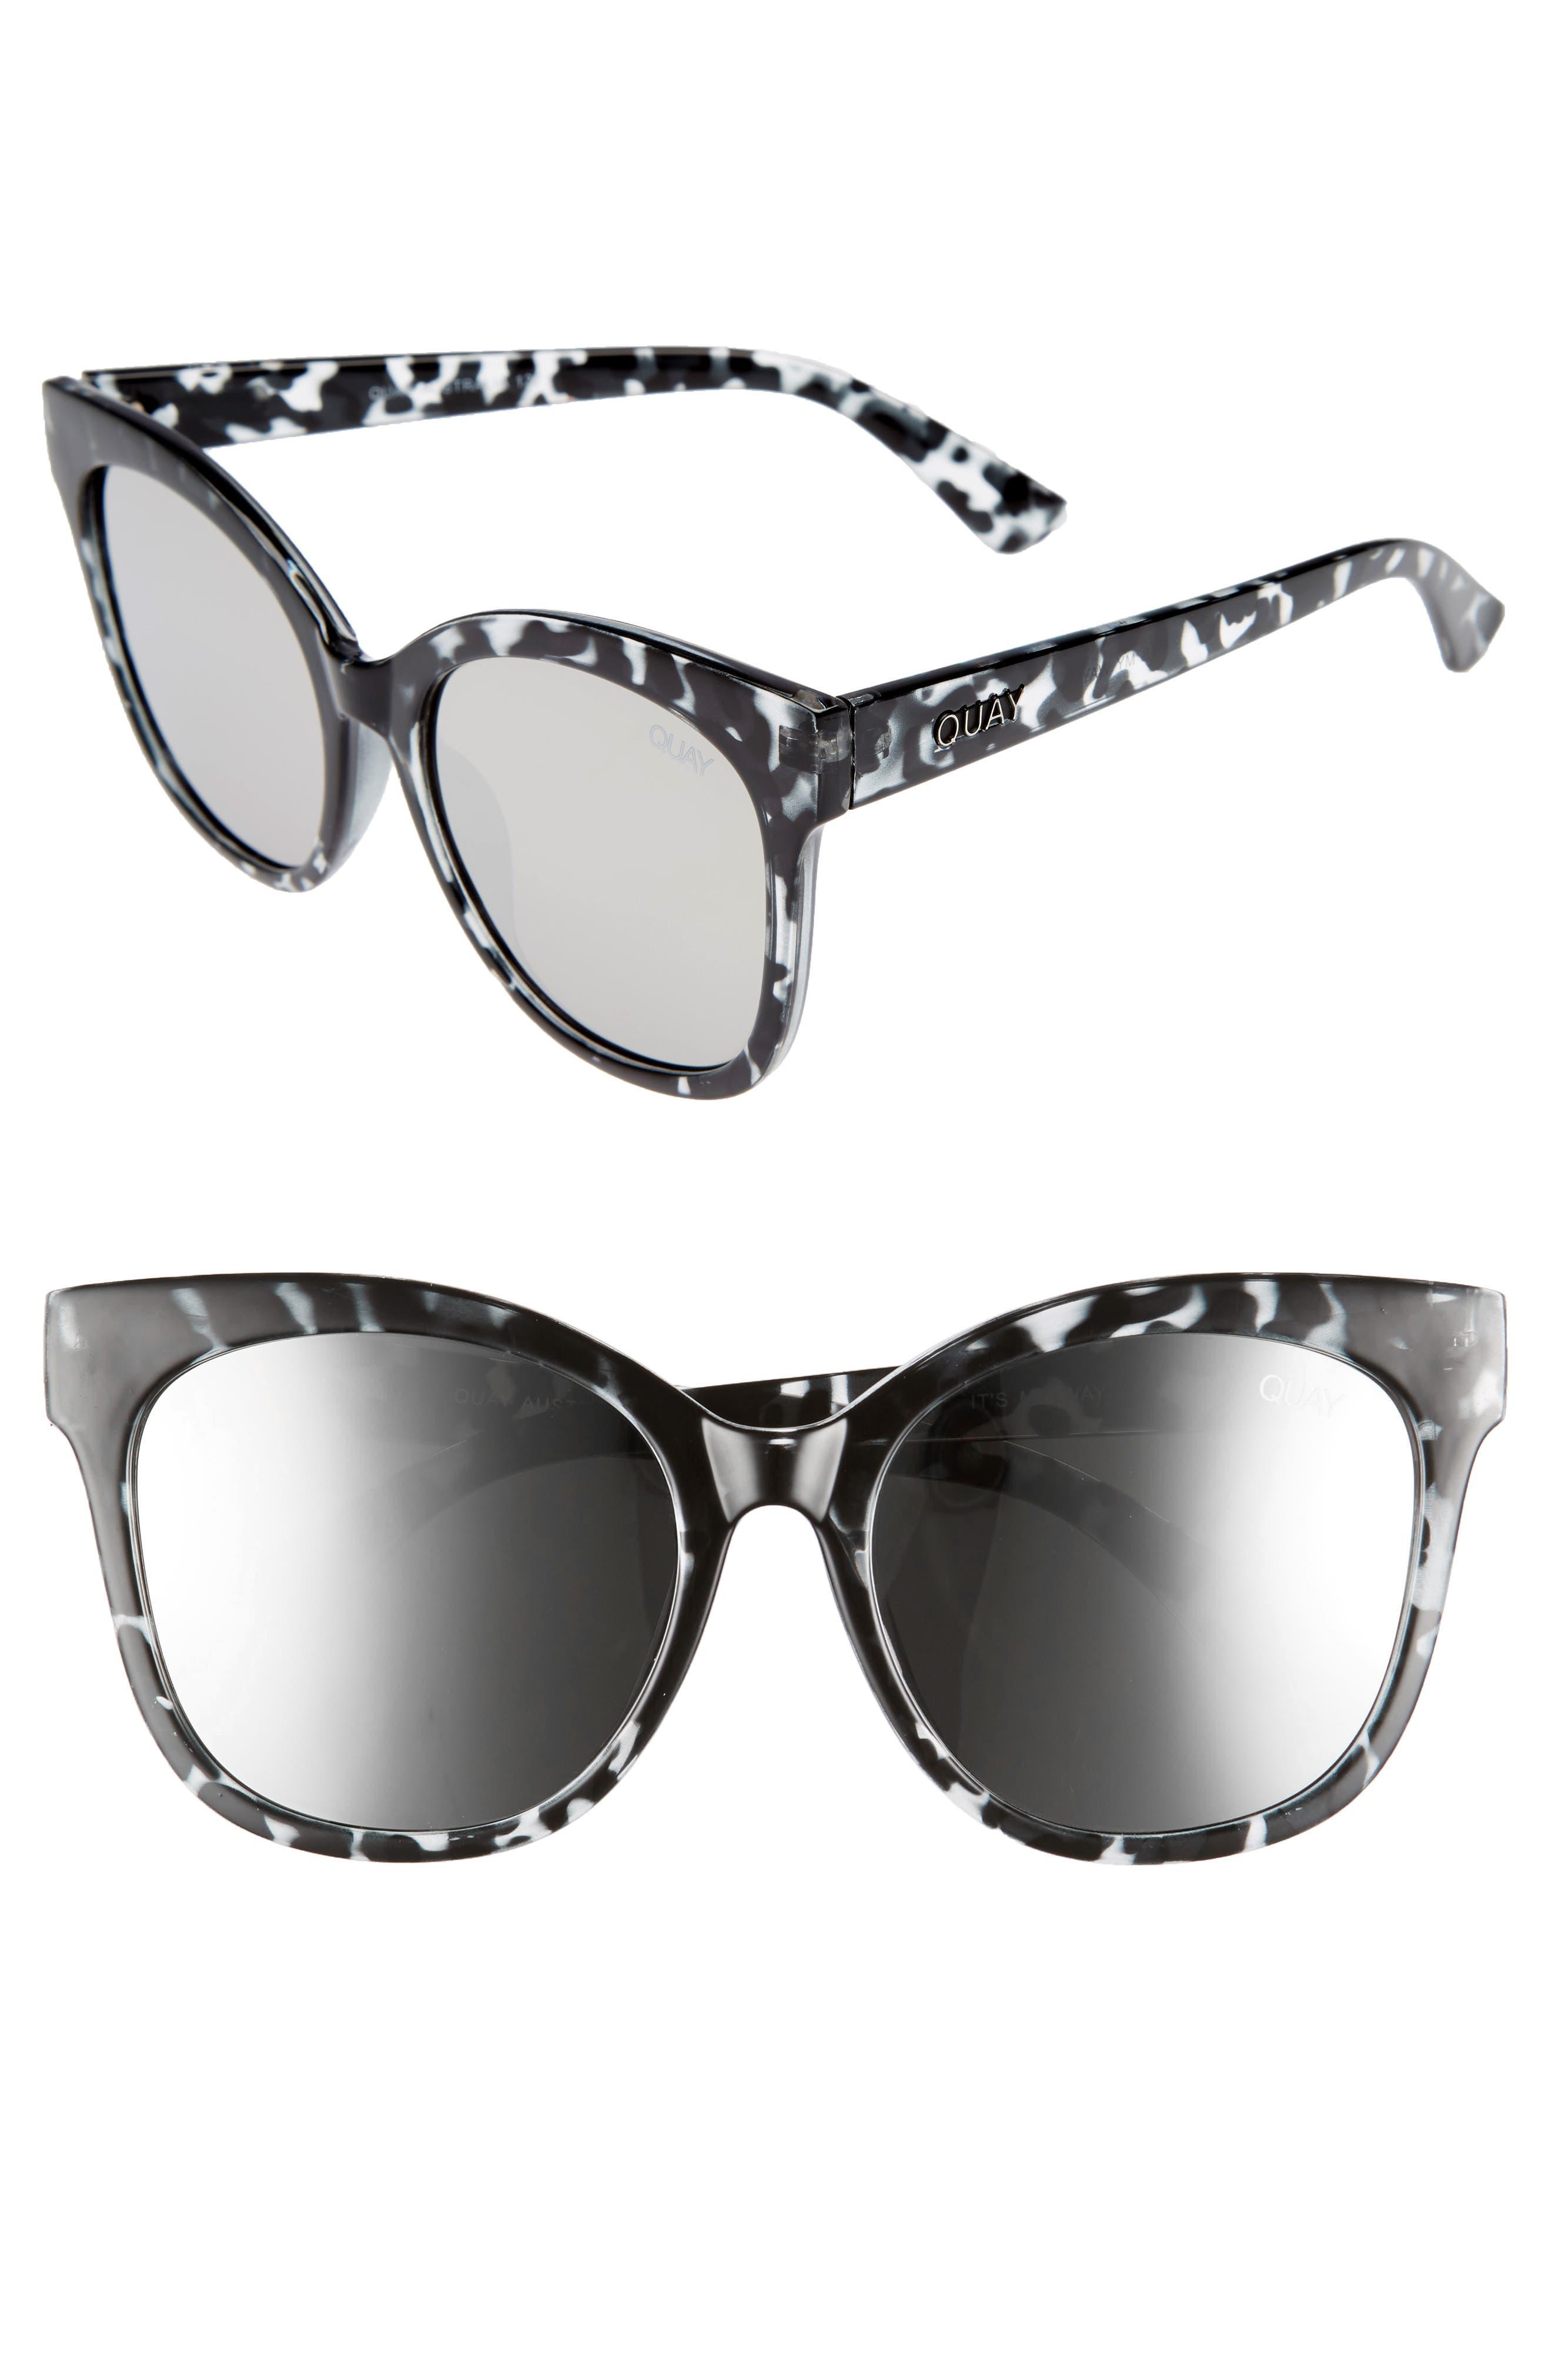 QUAY AUSTRALIA Its My Way 55mm Sunglasses